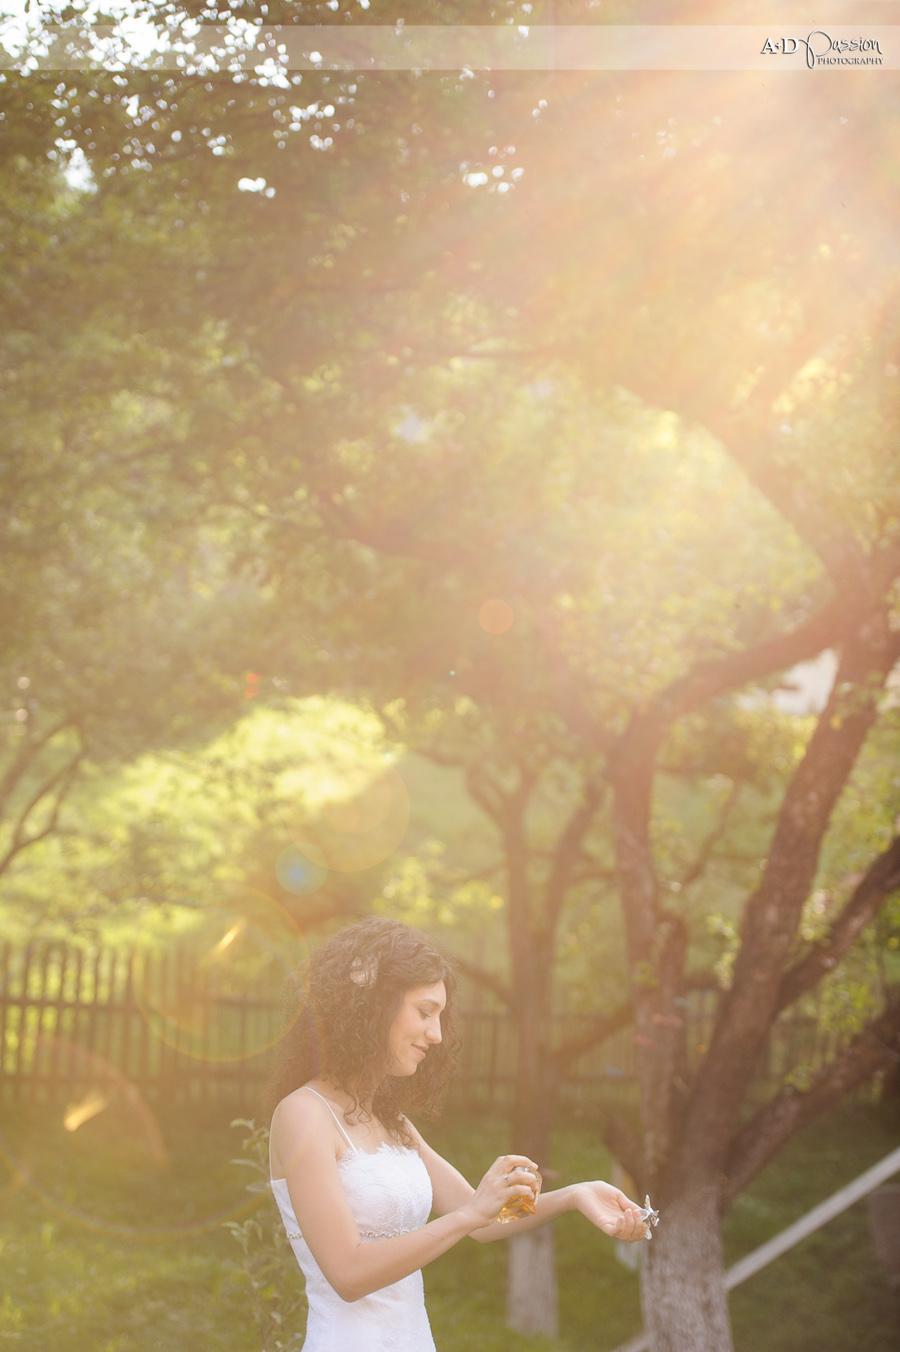 AD Passion Photography | ad-passion_fotograf-profesionist-nunta_fotografie-de-nunta-in-brasov-moeciu_andreea-si-viorel_016 | Adelin, Dida, fotograf profesionist, fotograf de nunta, fotografie de nunta, fotograf Timisoara, fotograf Craiova, fotograf Bucuresti, fotograf Arad, nunta Timisoara, nunta Arad, nunta Bucuresti, nunta Craiova